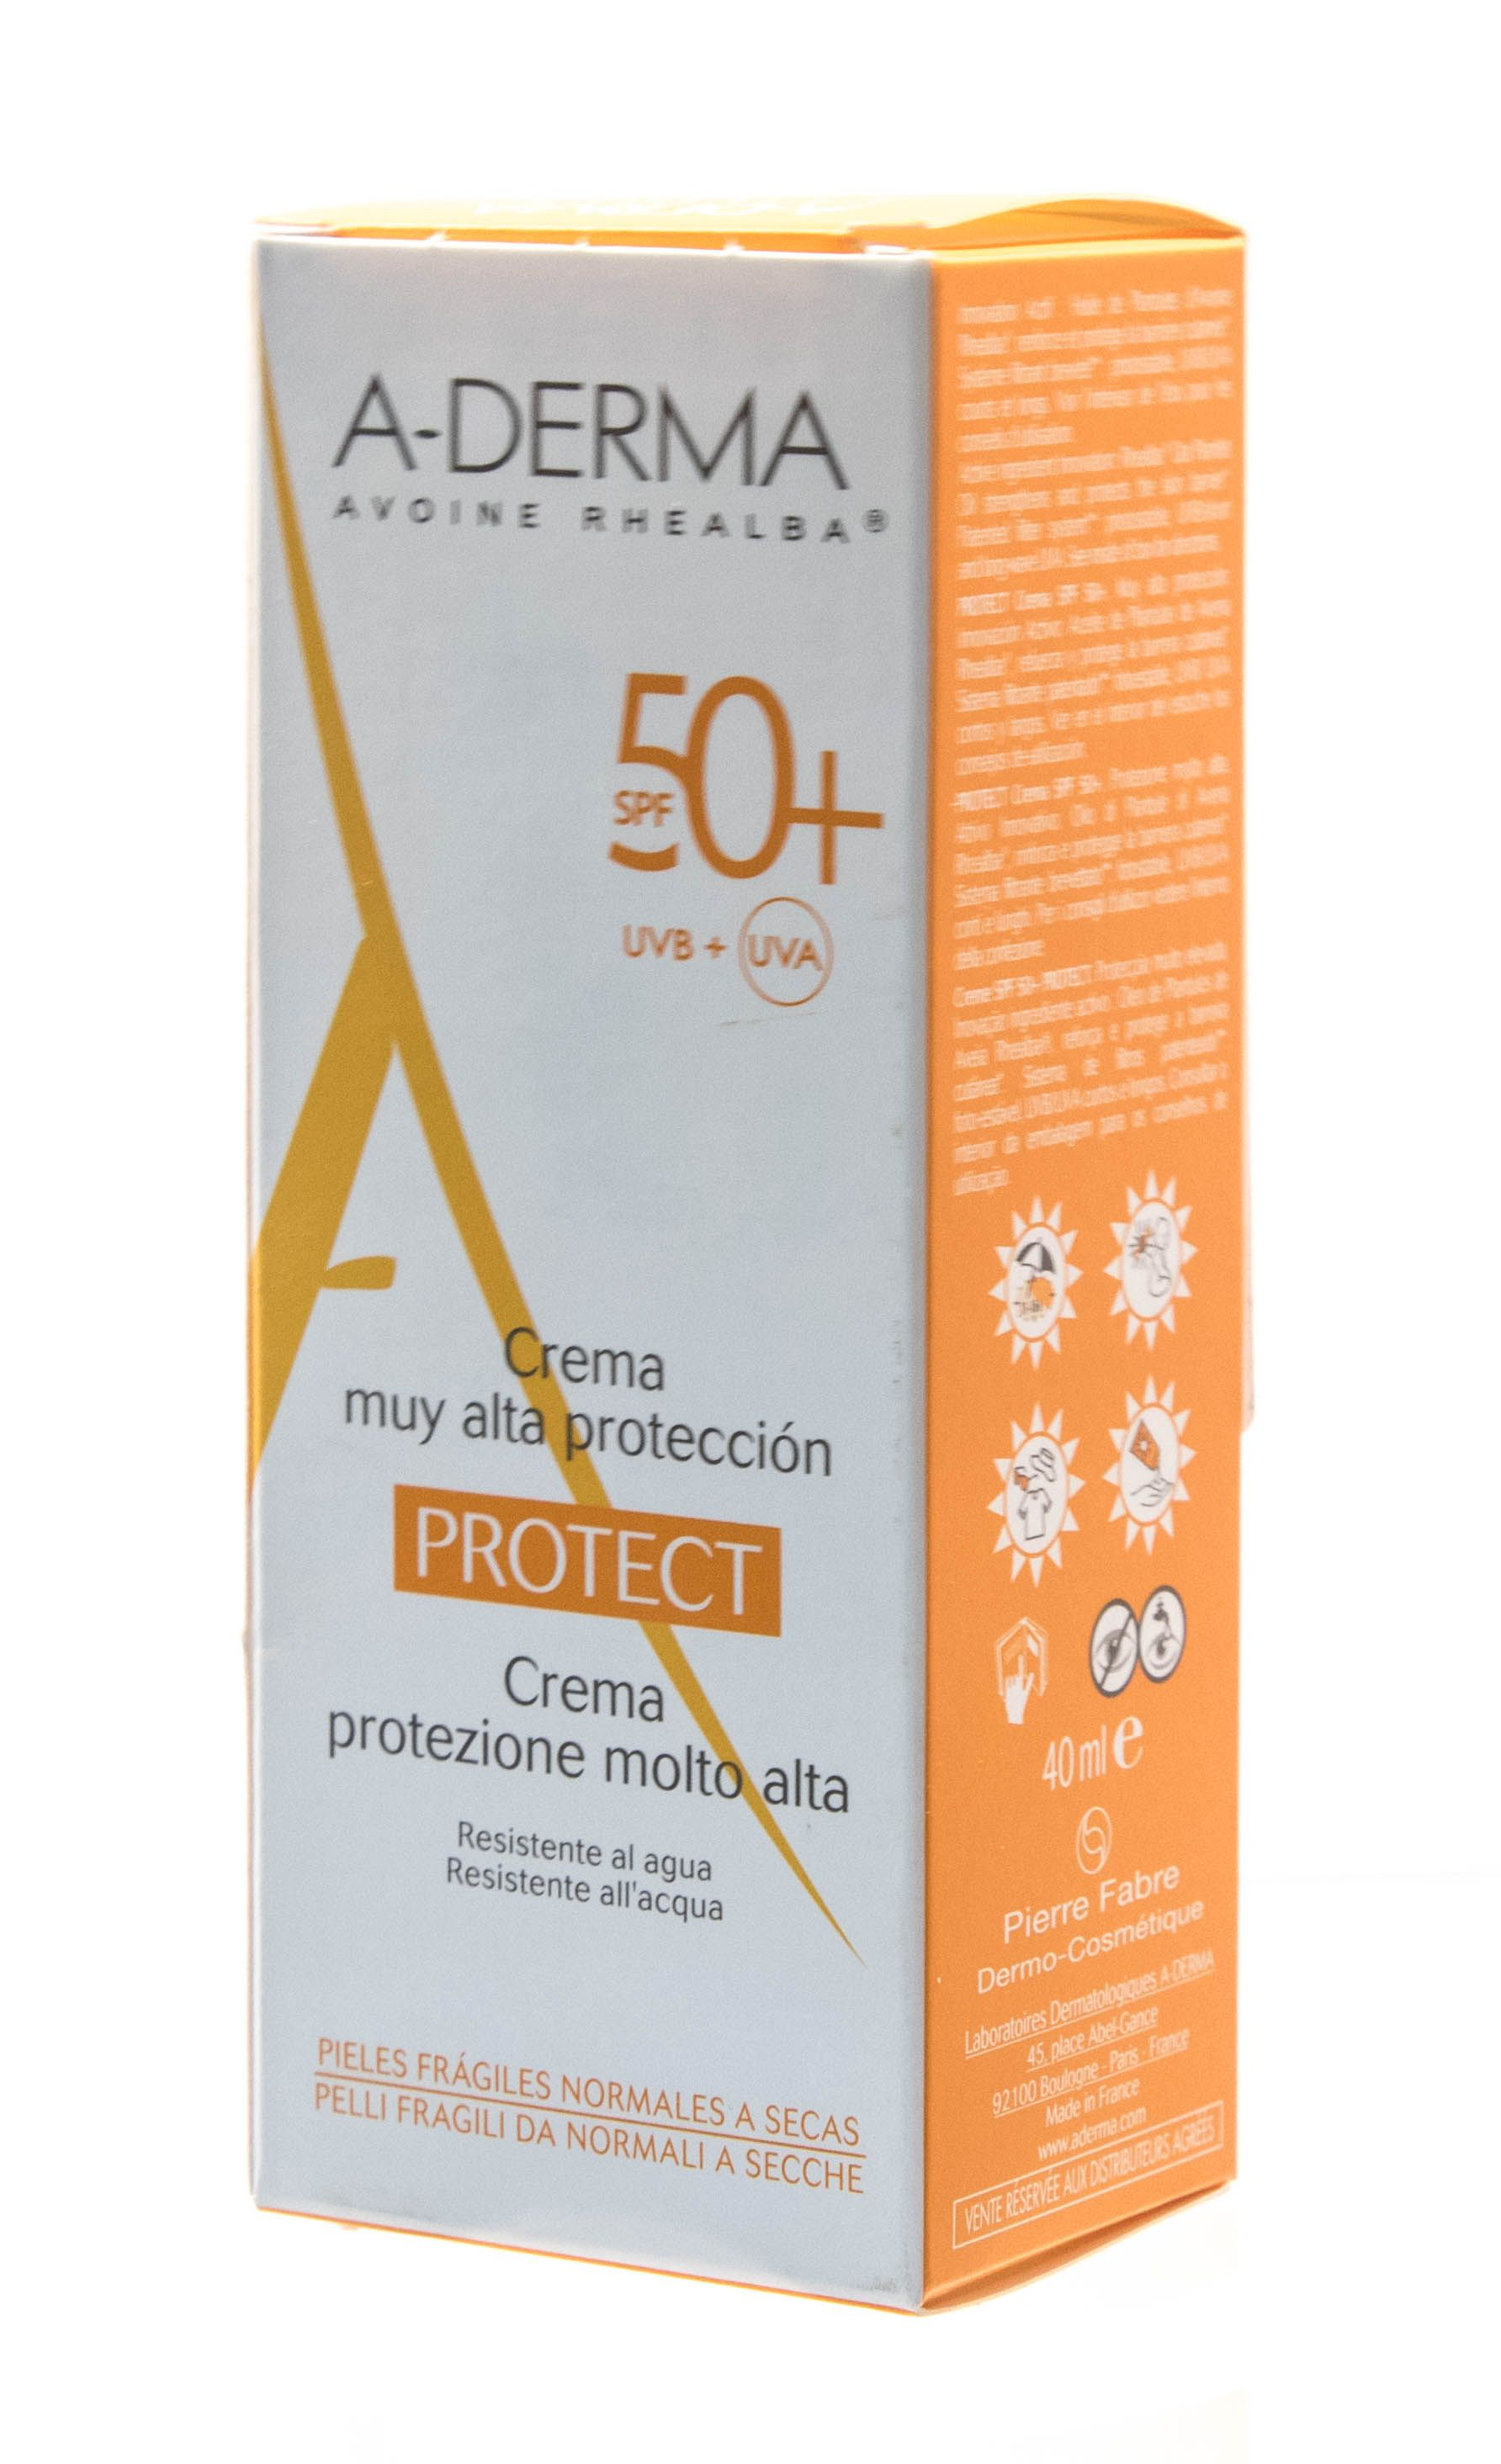 A-Derma Protect Крем солнцезащитный SPF 50+, крем для лица, 40 мл, 1 шт.